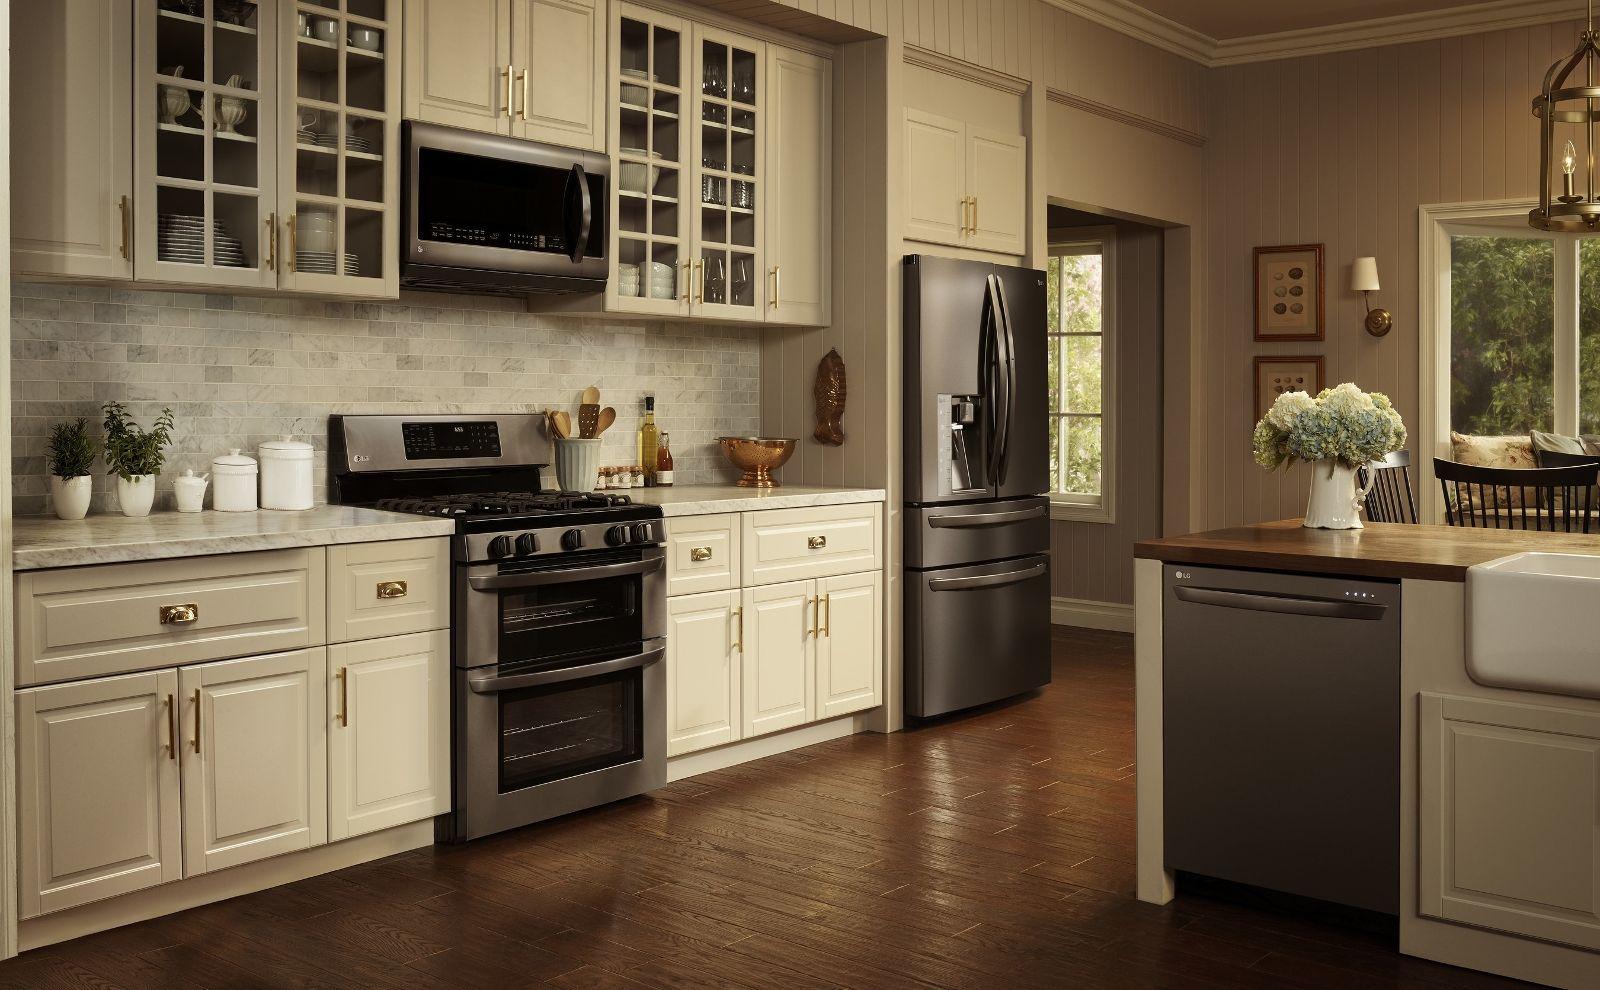 Lg Black Stainless Steel Kitchen Appliances Bring Bold Update To